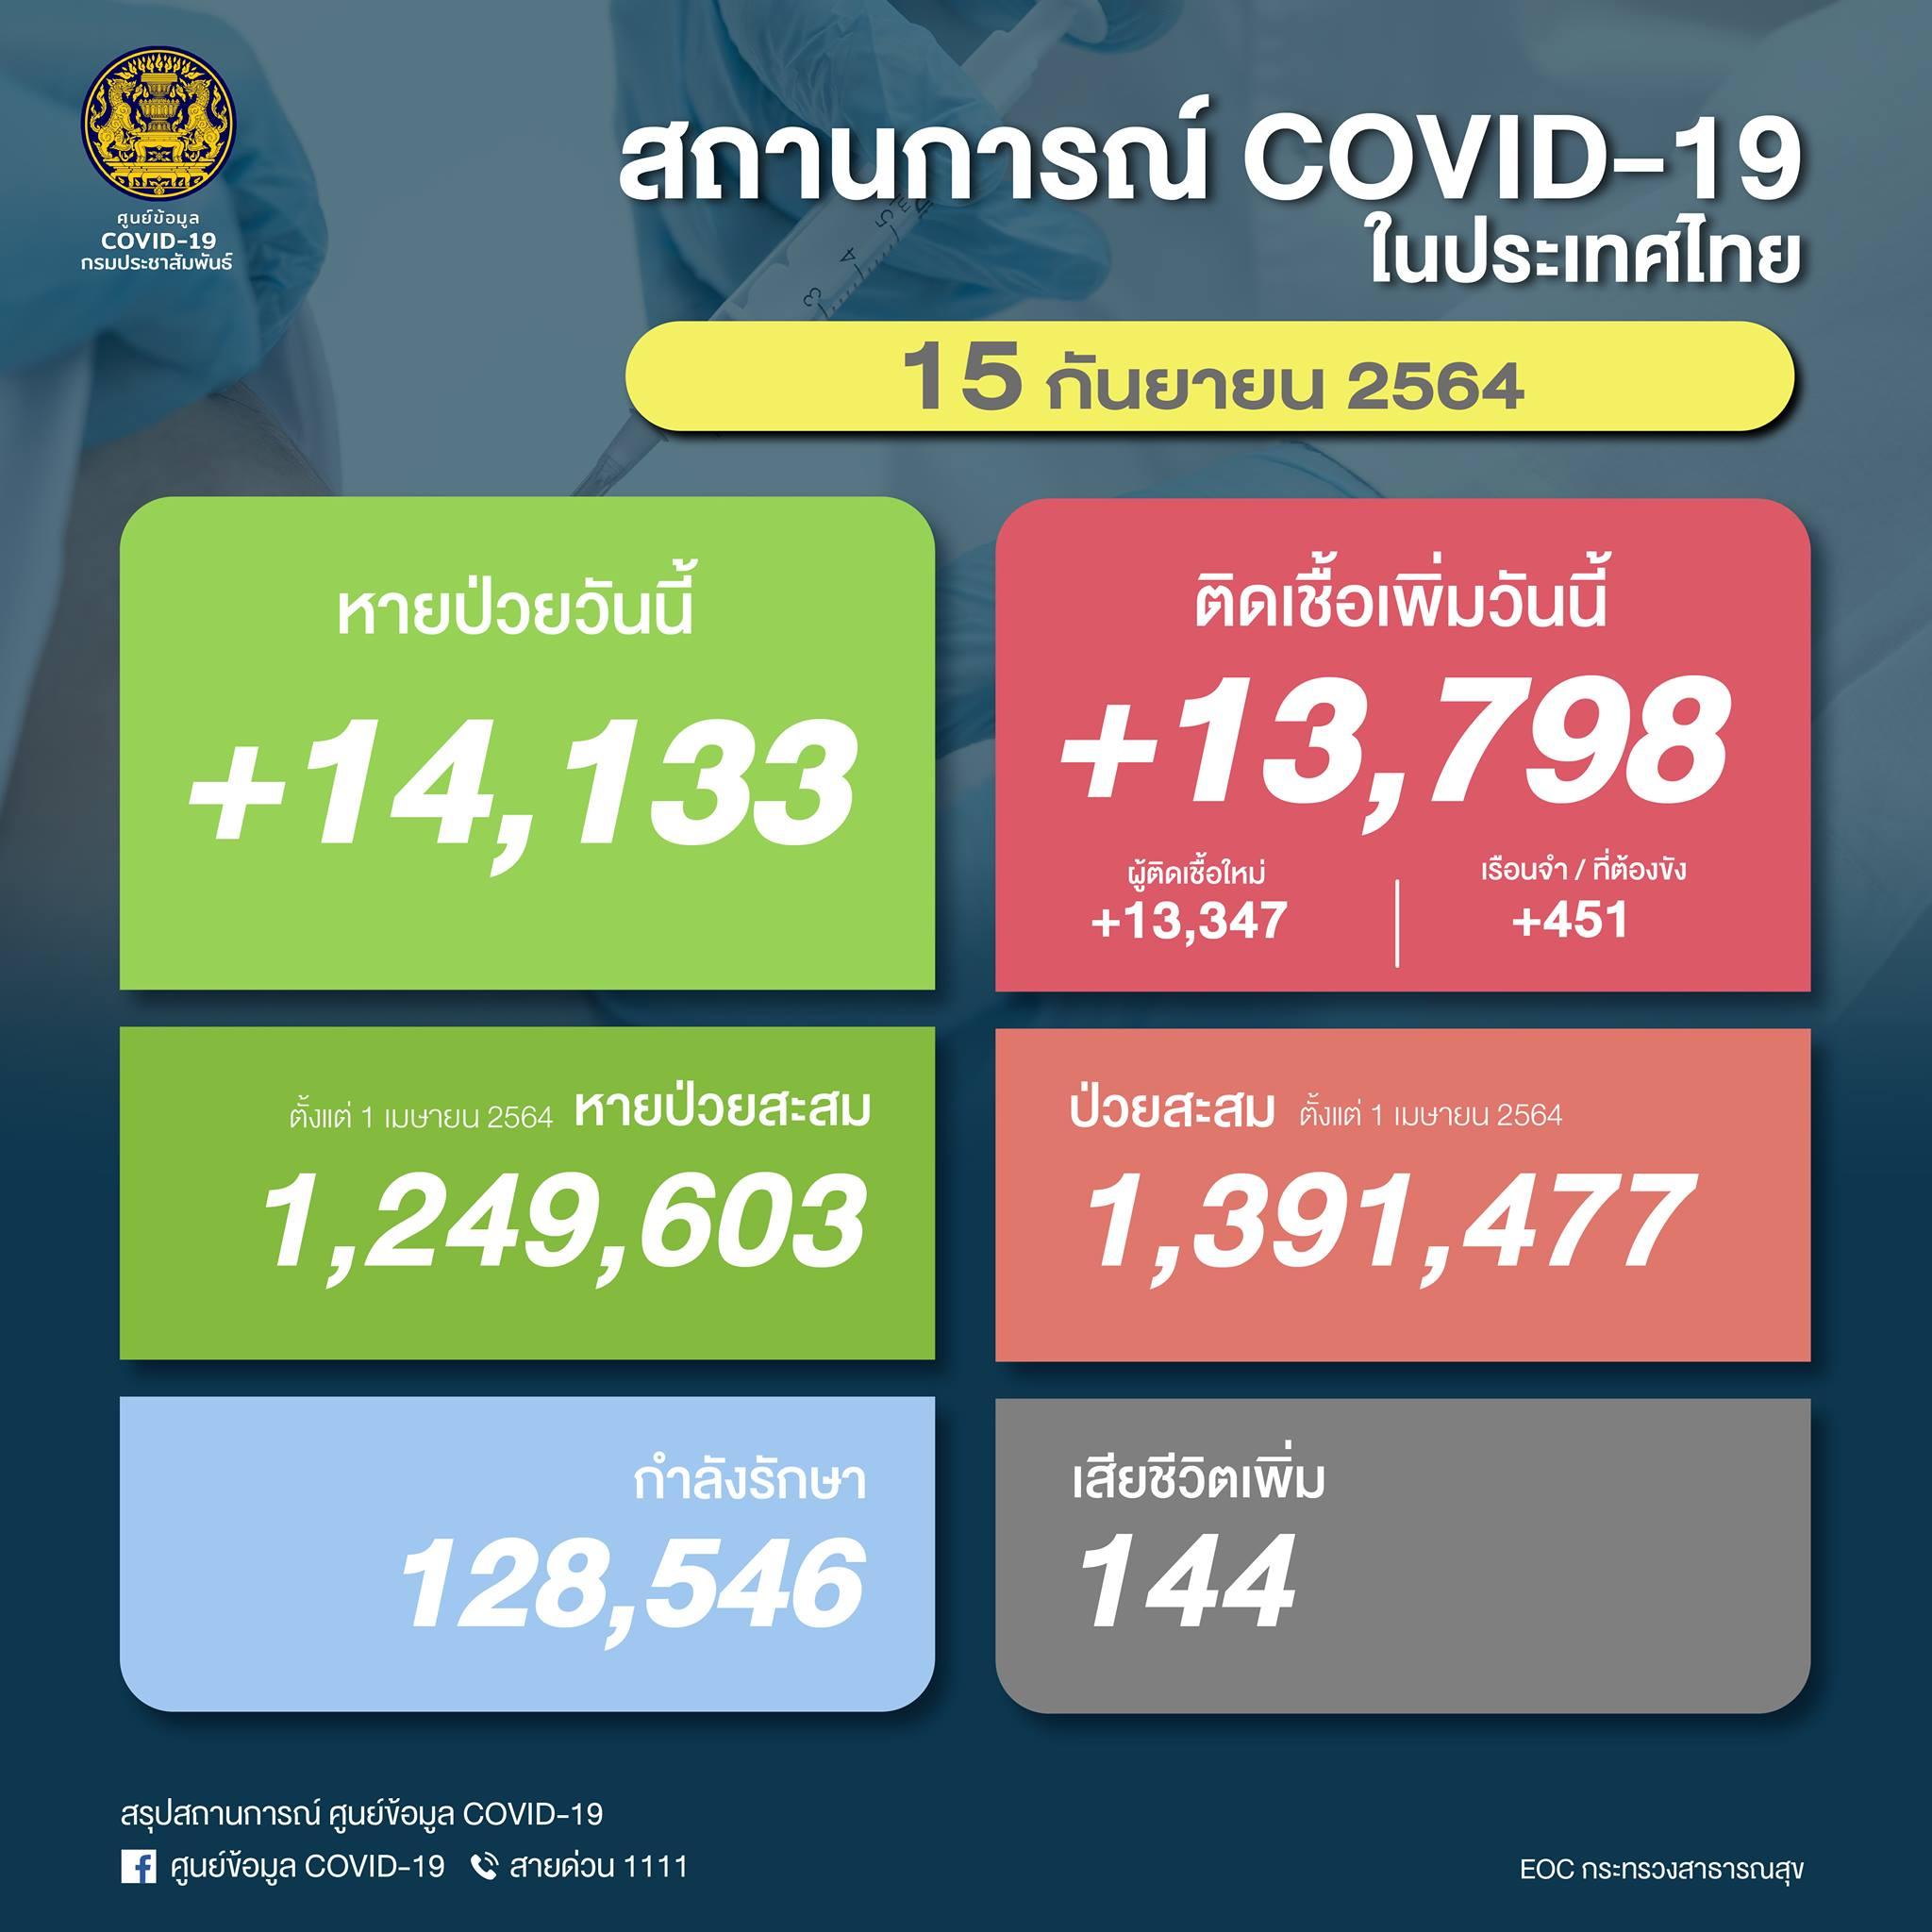 May be an image of text that says 'COVID- กรมประซาสัมพันธ์ สถานการณ์ COVID-19 ในประเทศไทย 15 กันยายน 2564 หายป่วยวันนี้ +14,133 ติดเชื้อเพิ่มวันนี้ +13,798 798 +13, ผู้ติดเชื้อใหม่ เรือนำ/ที่ ที่ต้องขัง +13,347 +451 ตั้งแต่ เมษายน2564 หายป่วยสะสม 1,249,603 ป่วยสะสม ตั้งแต่ เhษายน2564 1,391,477 กำลังรักษา 128, 128,546 เสียชีวิตเพิ่ม 144 สรุปสถานการณ์ ศูนย์ข้อมูล COVID- 19 f ศูนย์ข้อมูล COVID-19 สายด่วน 1111 EOCกระทรวงสาธadณeสุข'